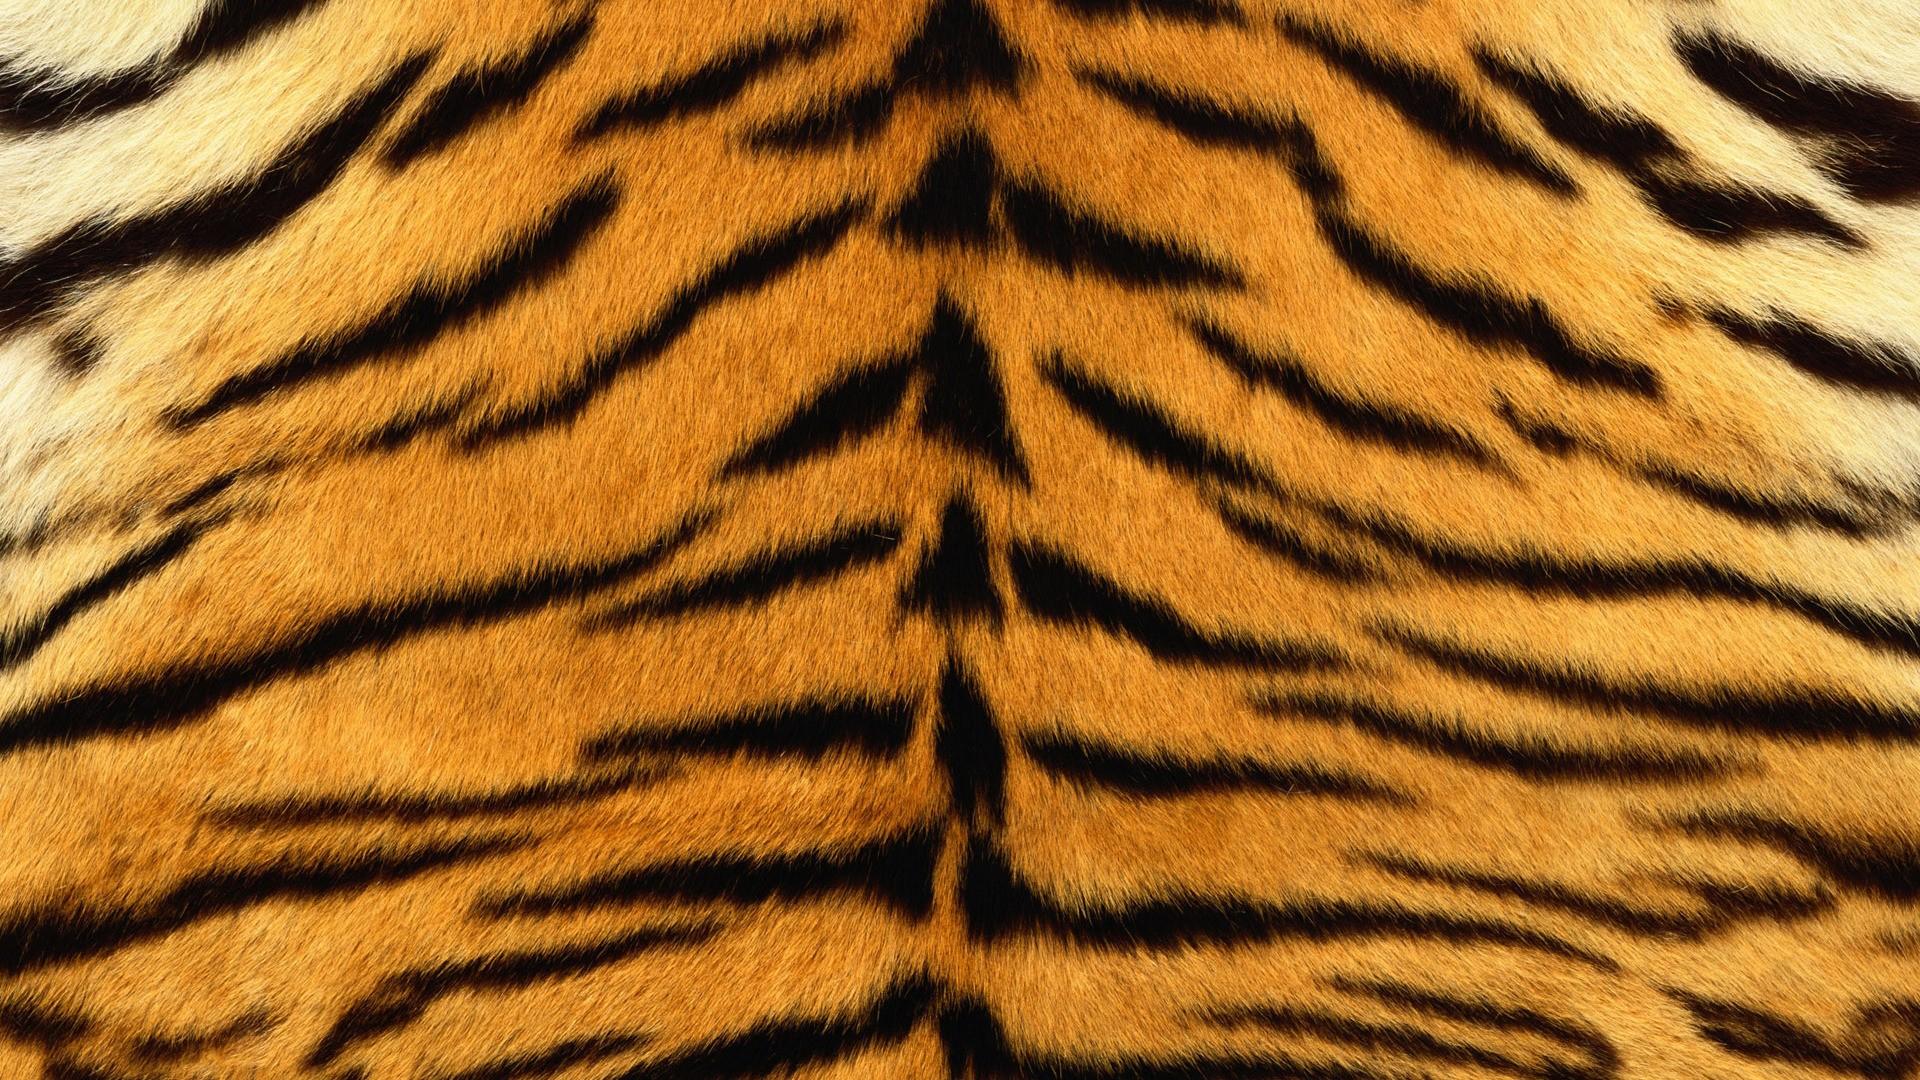 Piel de tigre - 1920x1080